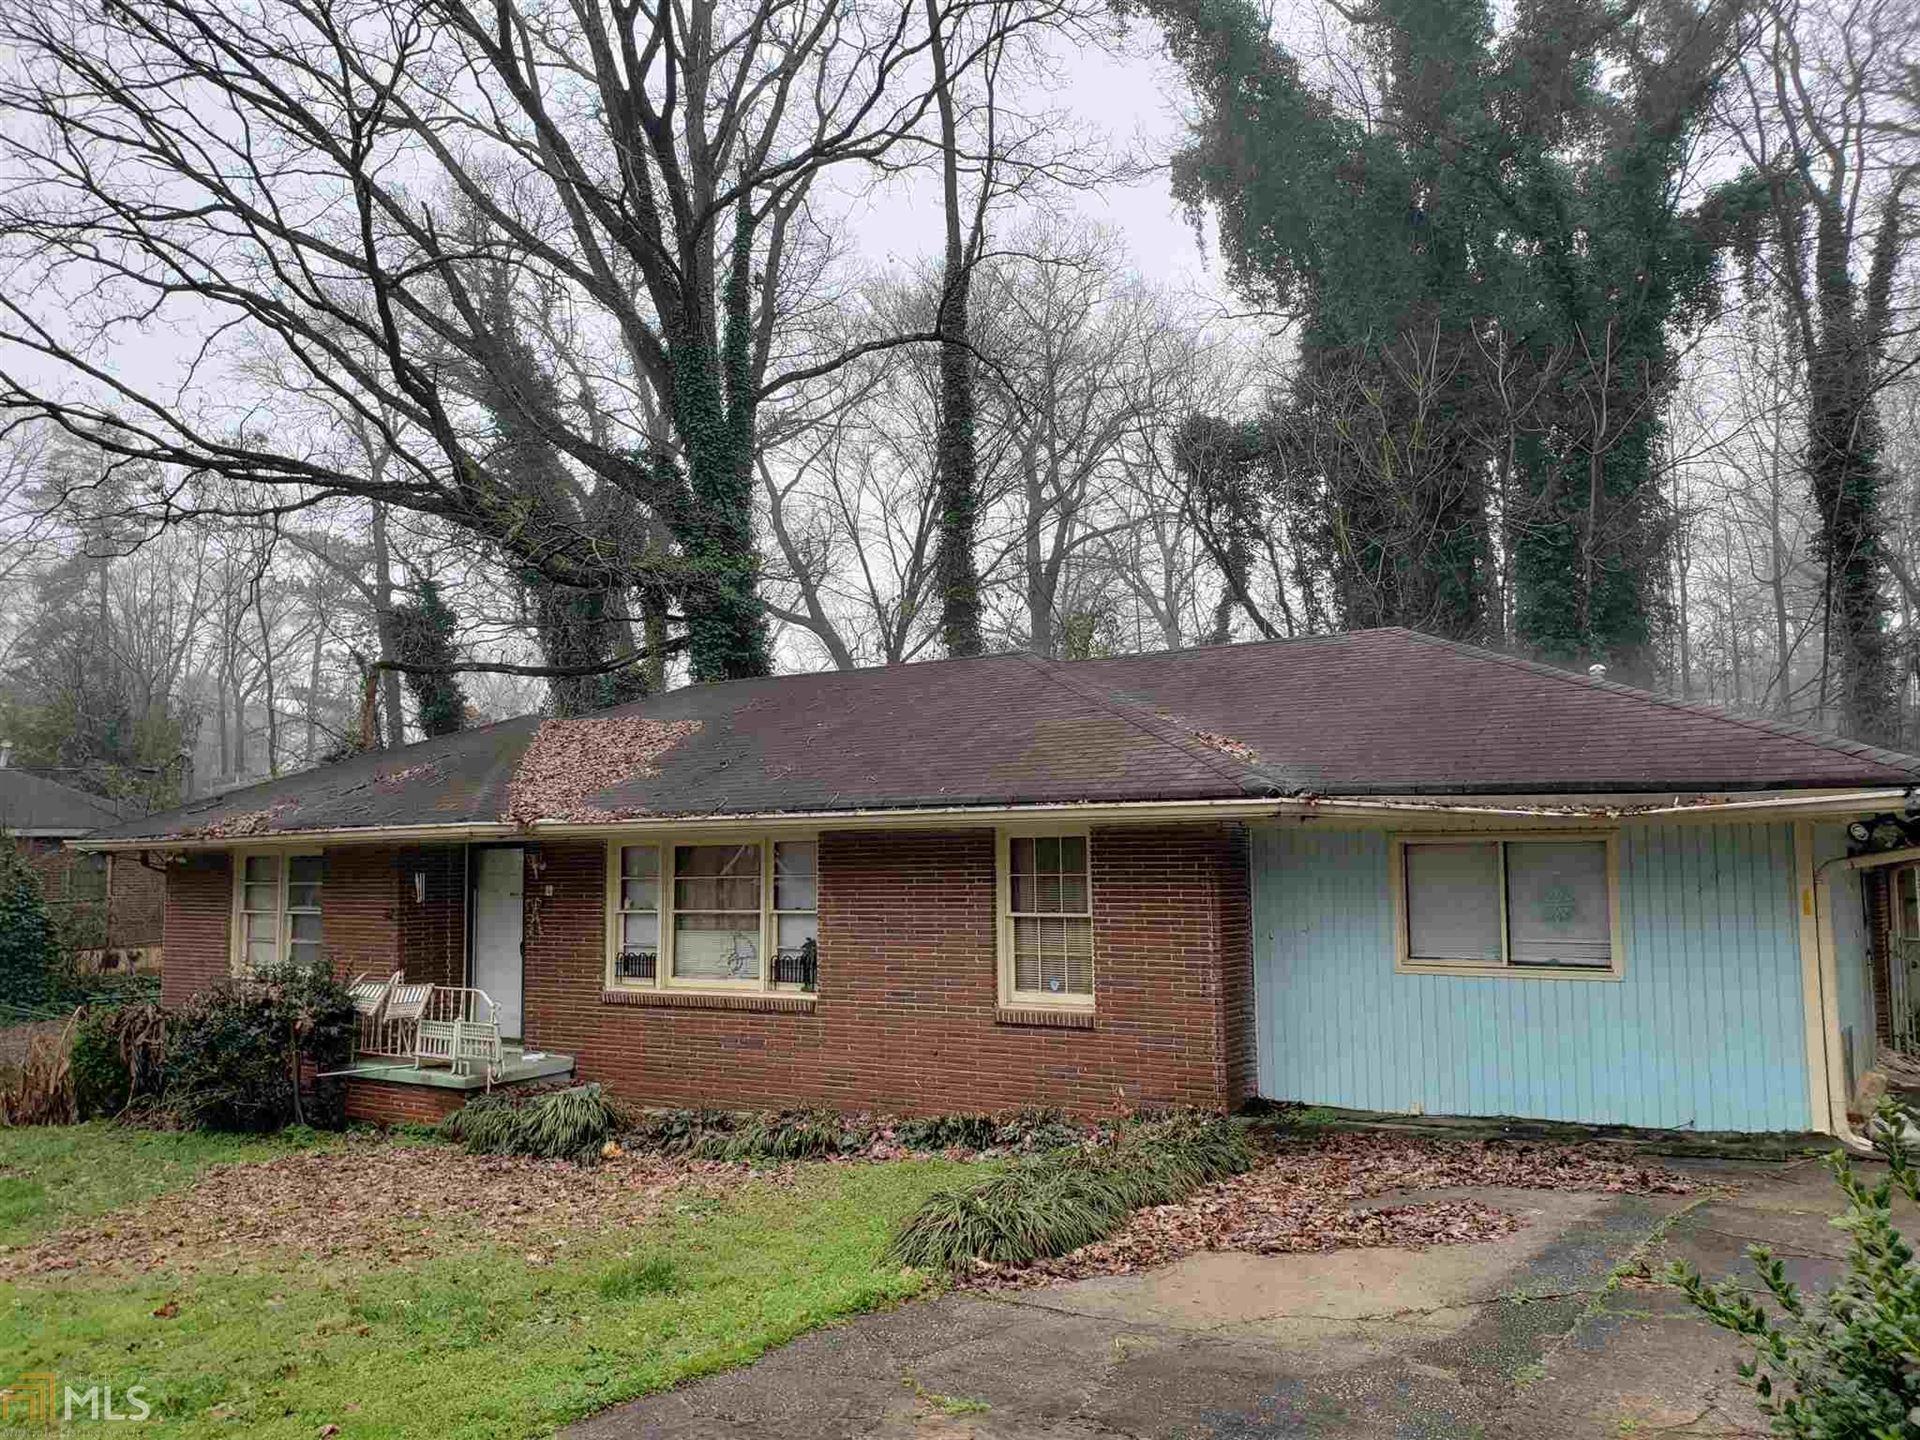 1231 Fayetteville Rd, Atlanta, GA 30316 - #: 8734996